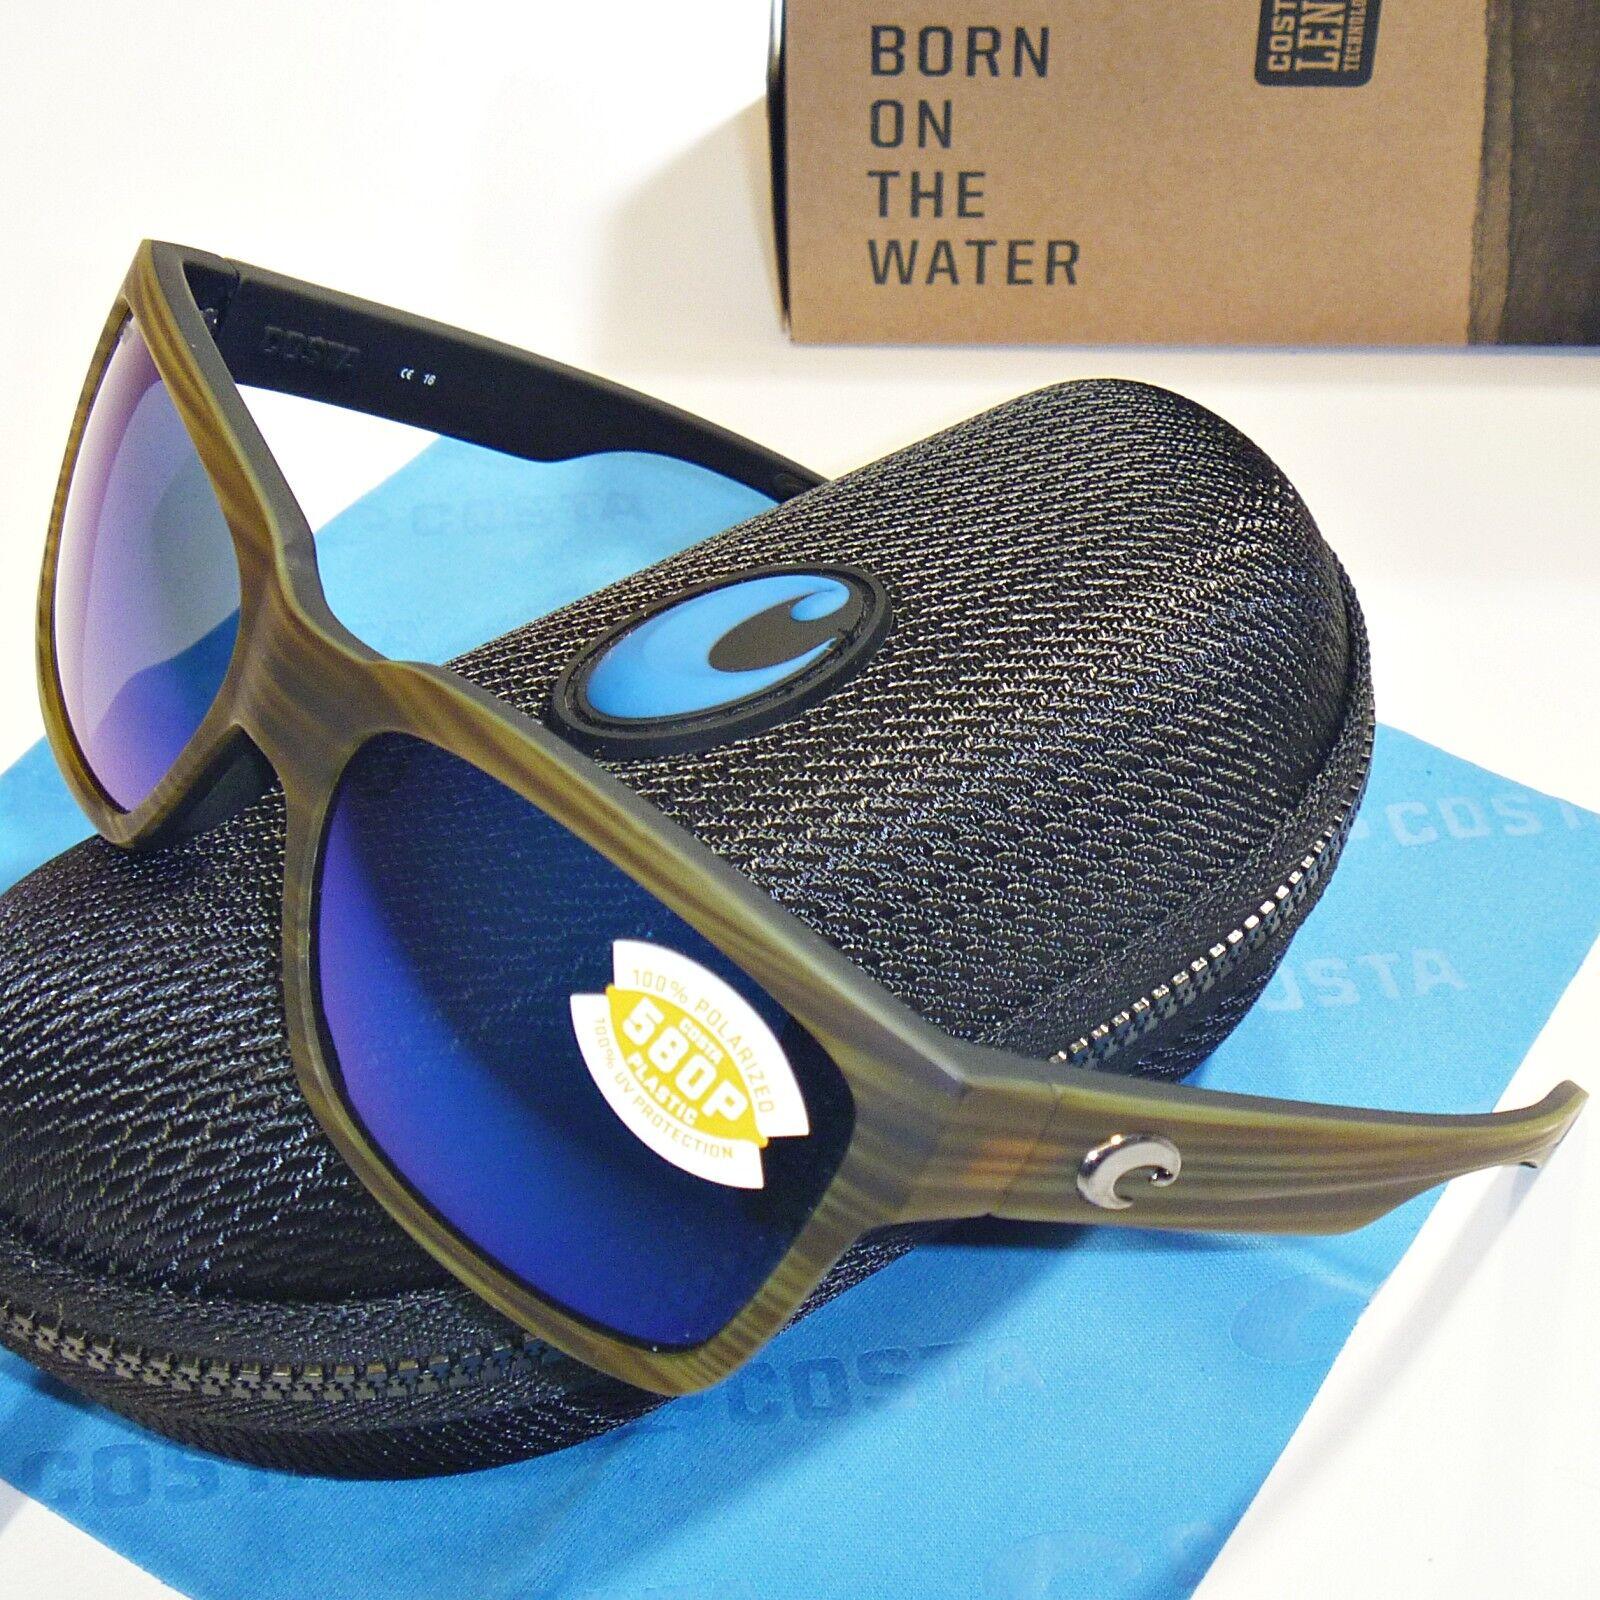 Costa Del Mar Playa Playa Playa Polarisierend Sunglasses-Matte Grün Teakholz   Blau Spiegel       Großer Räumungsverkauf  7c8c1a